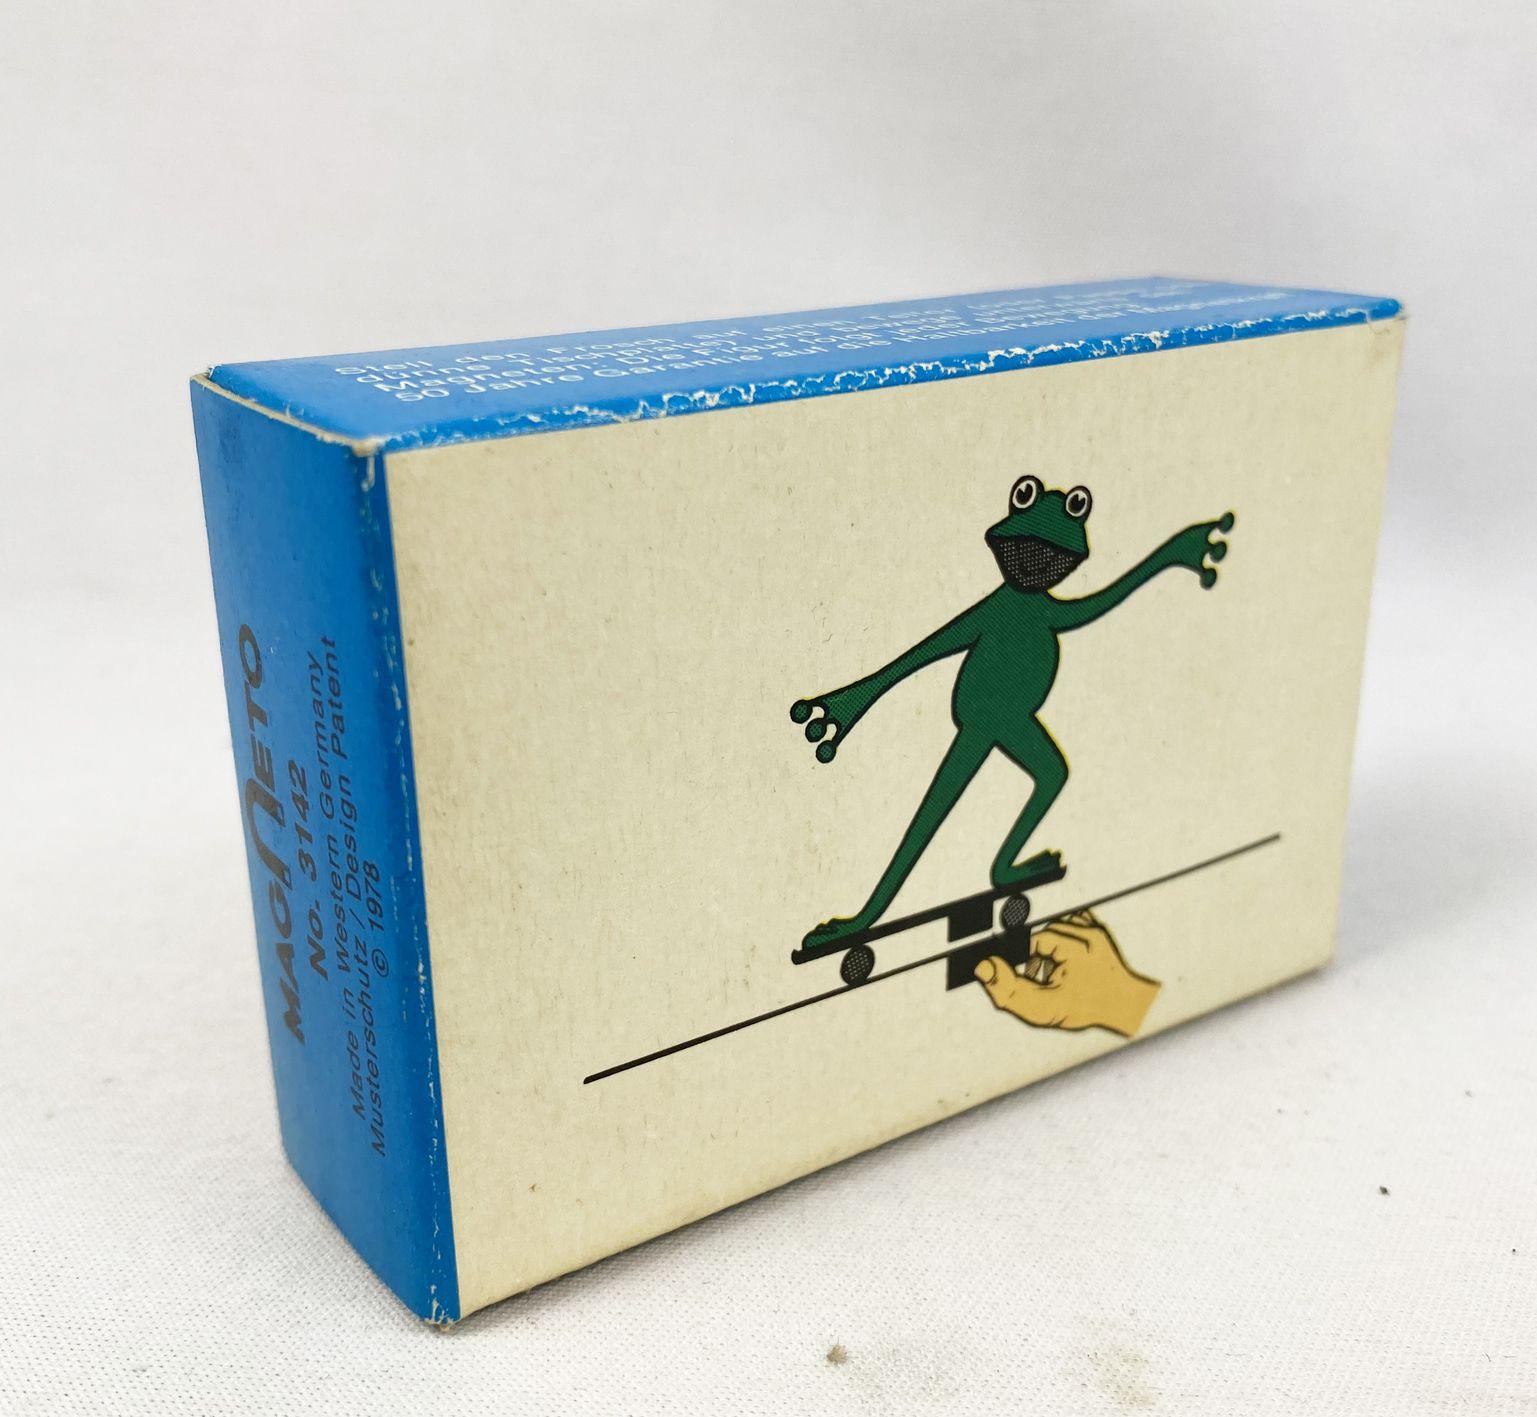 The Skateboard Champion - Magneto 1978